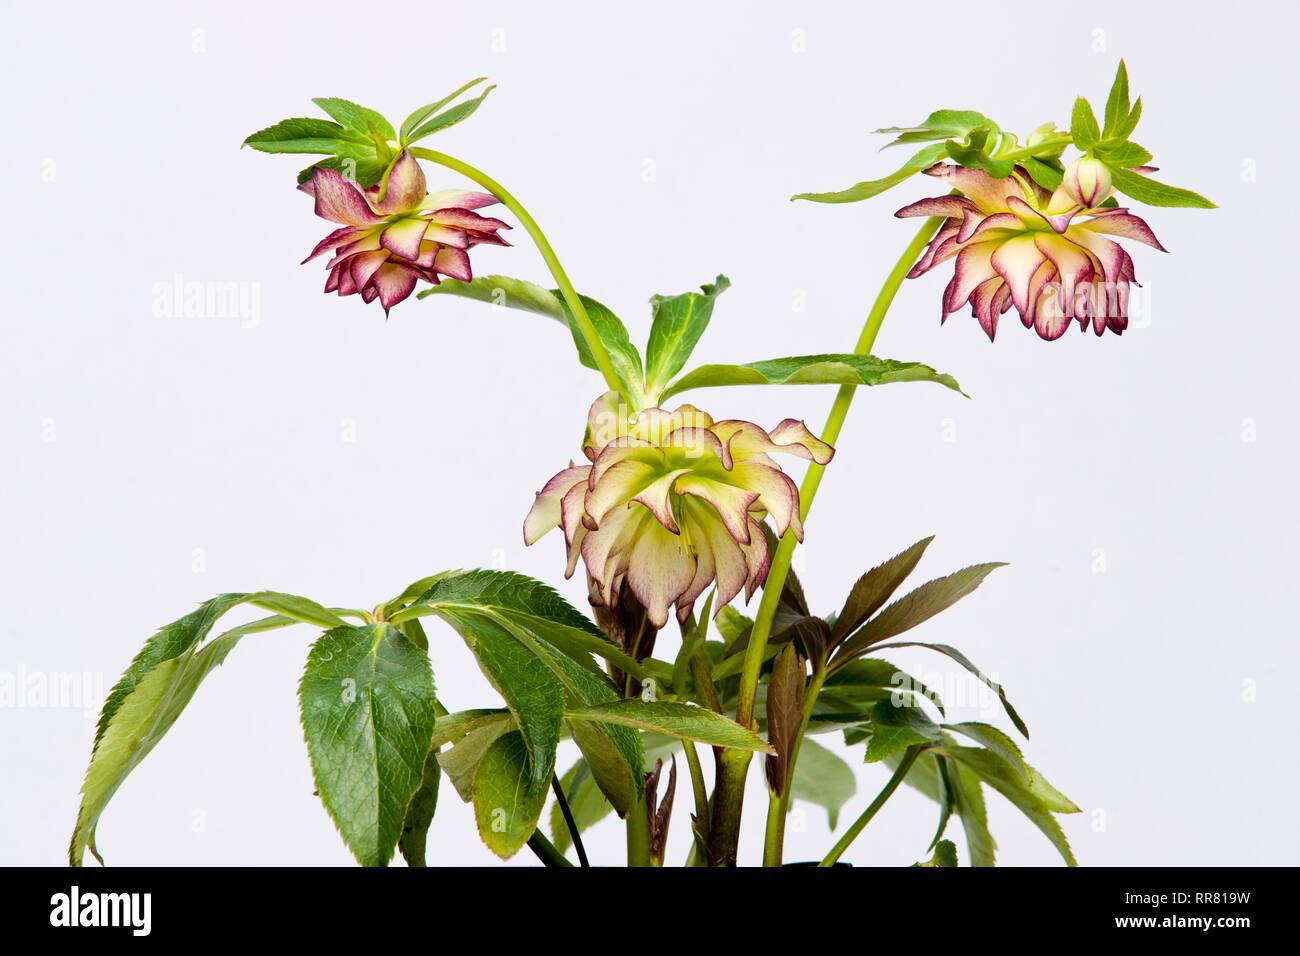 Helleborus x hybridus 'Sun Flare' - Stock Image